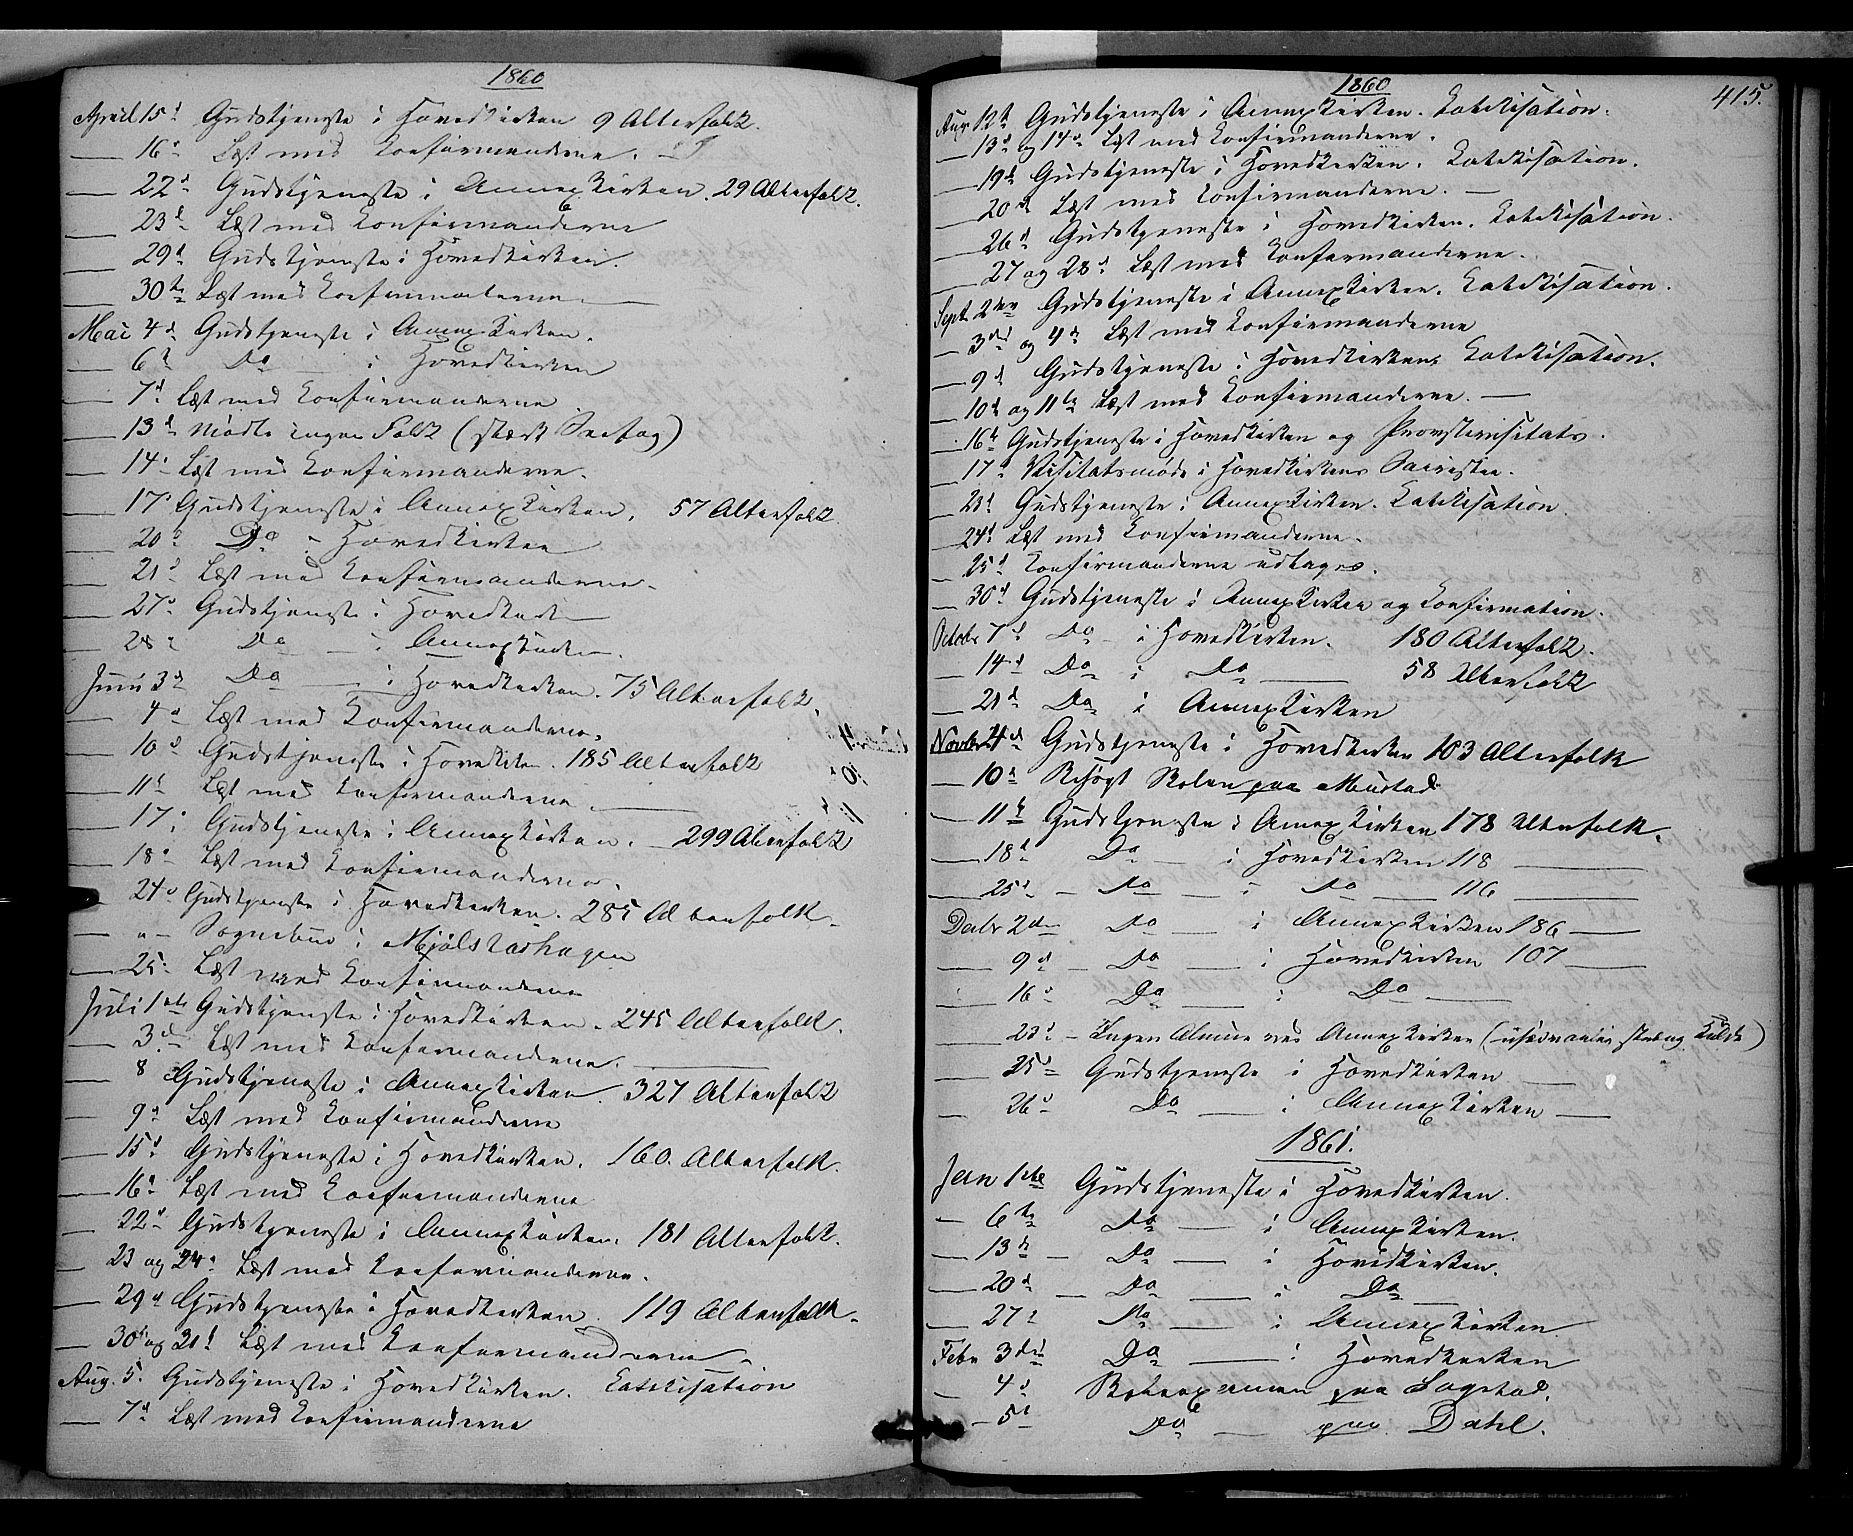 SAH, Vardal prestekontor, H/Ha/Haa/L0006: Ministerialbok nr. 6, 1854-1866, s. 415